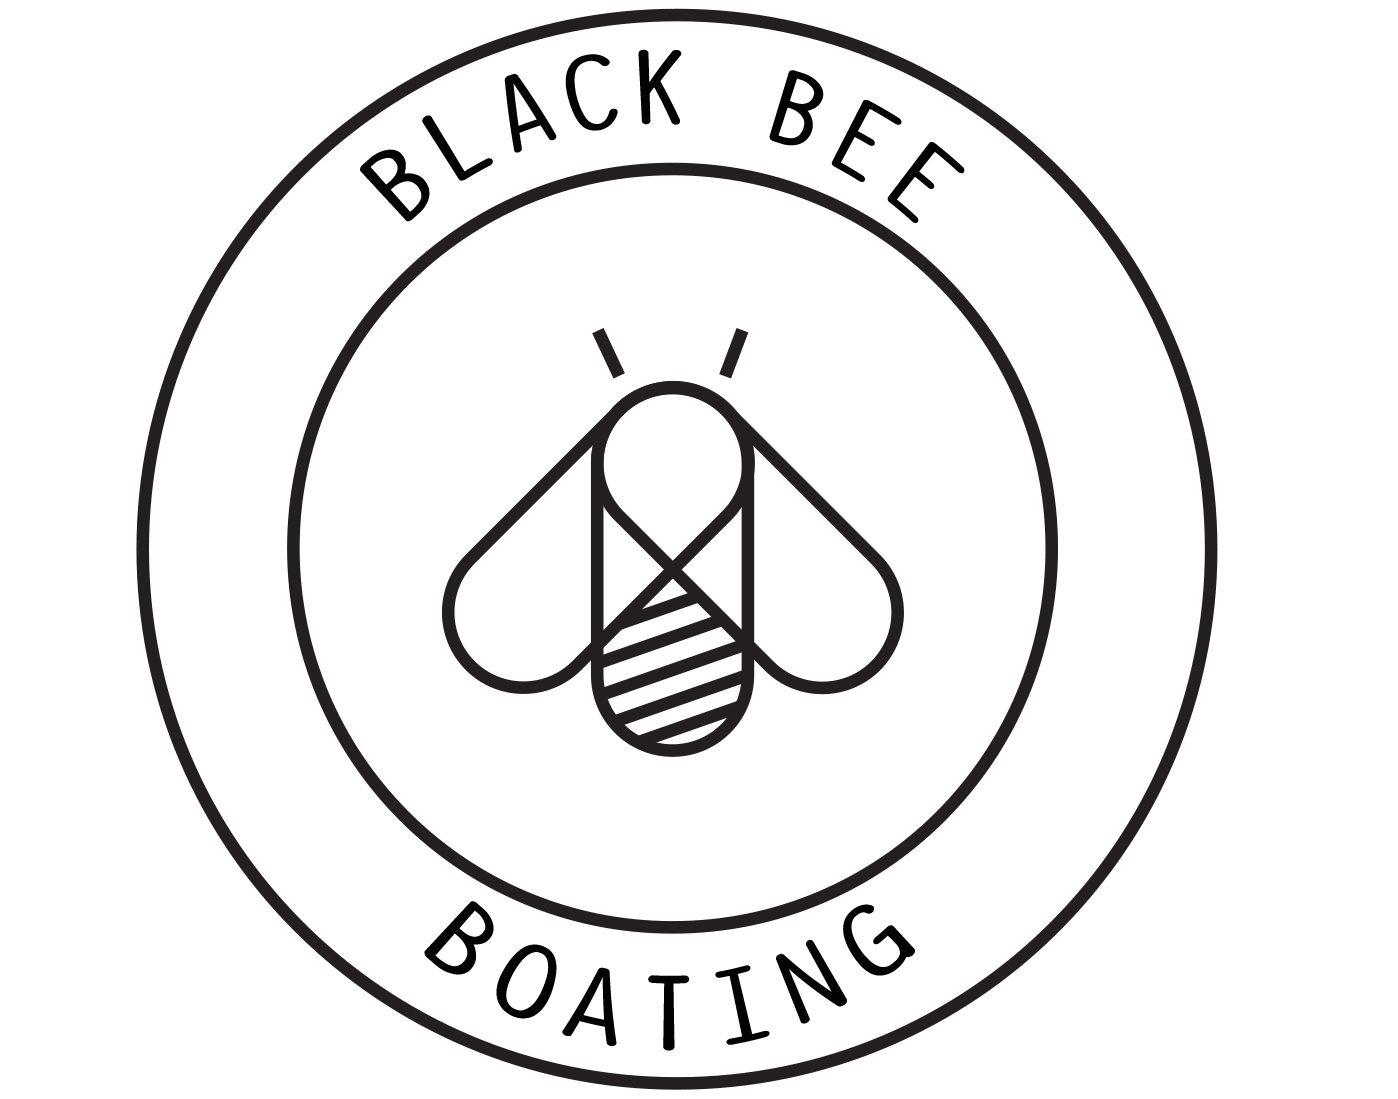 Black Bee Boating